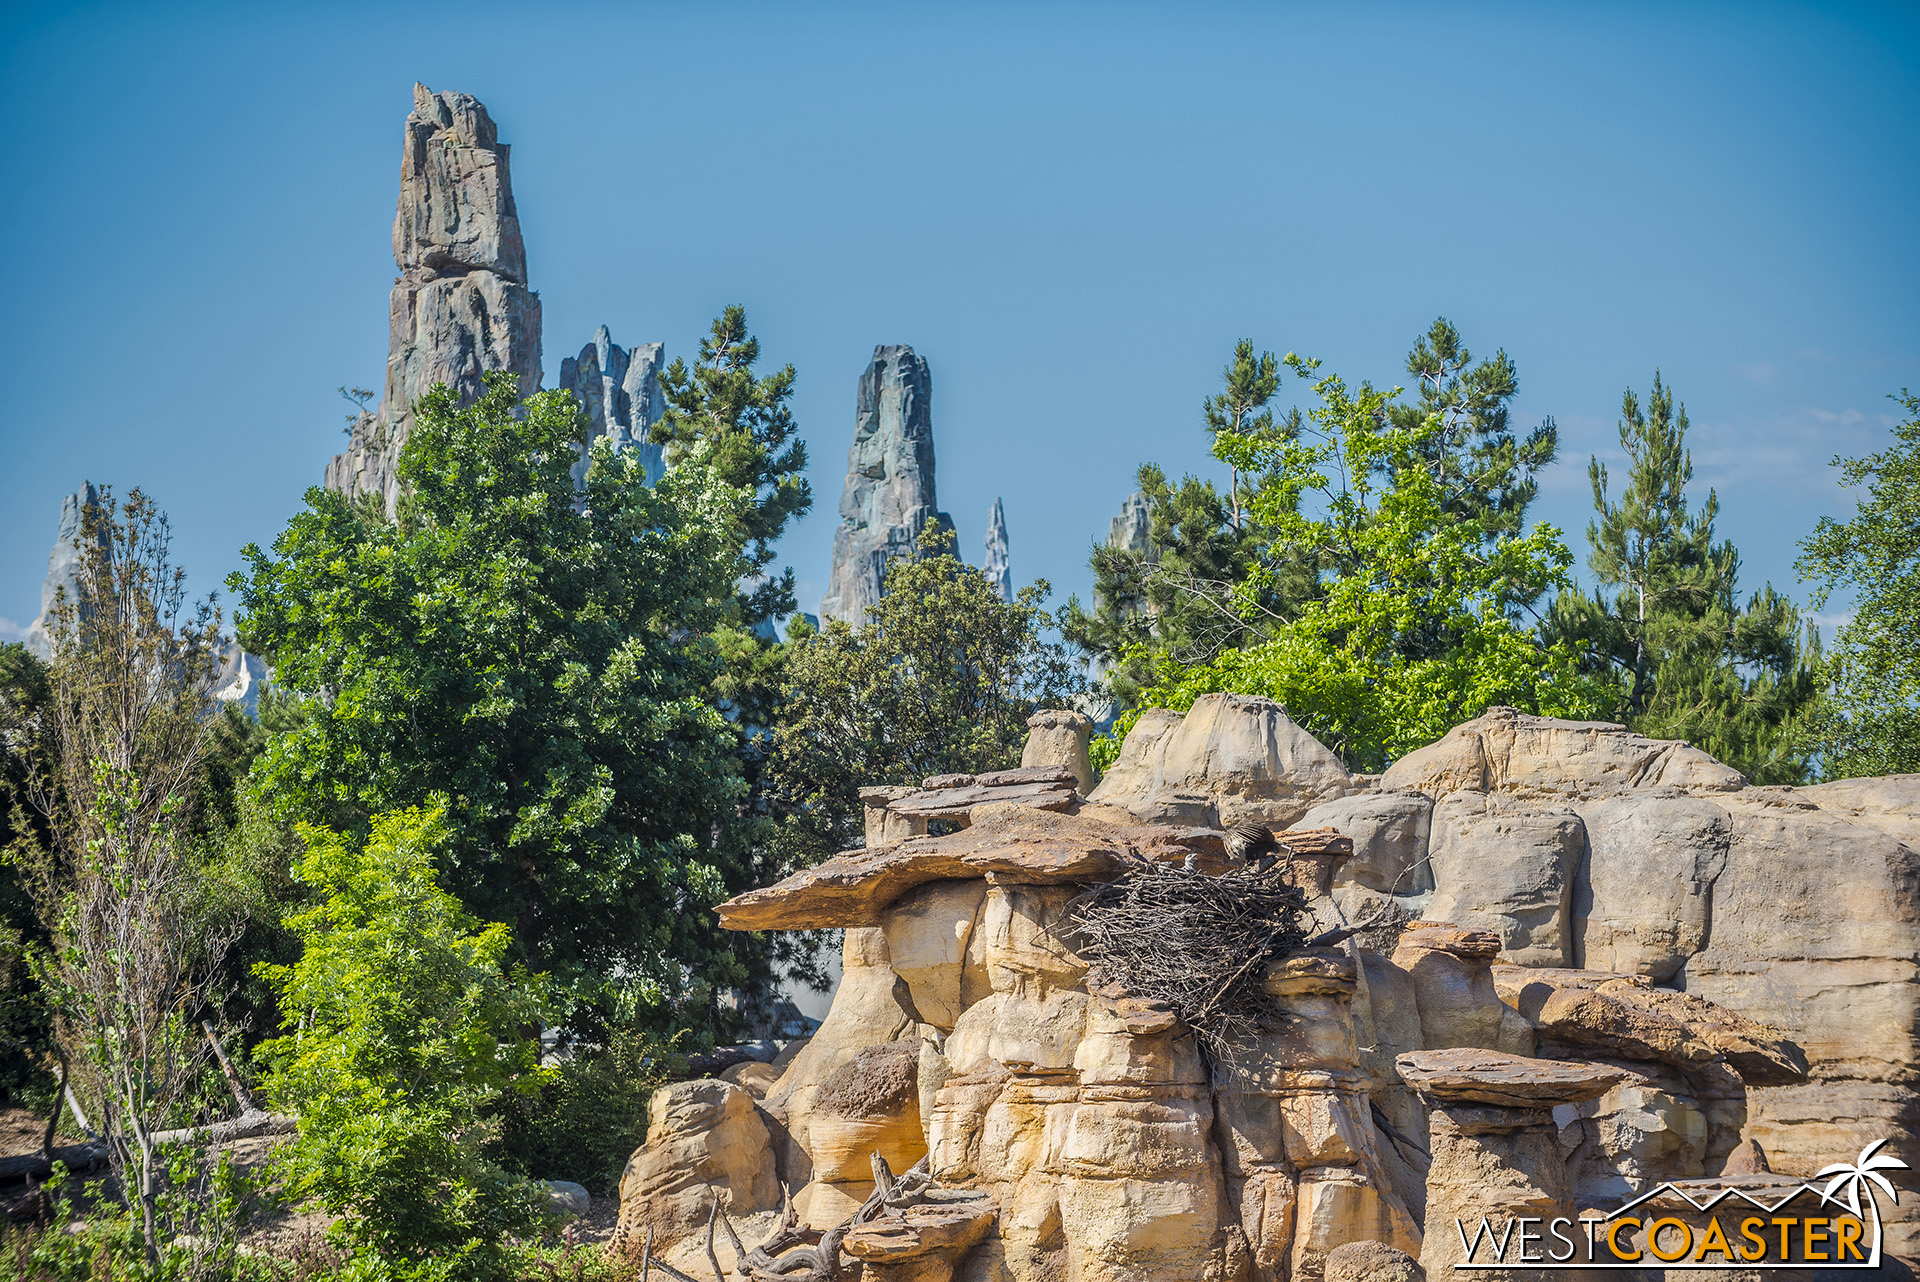 Rocks and rocks.